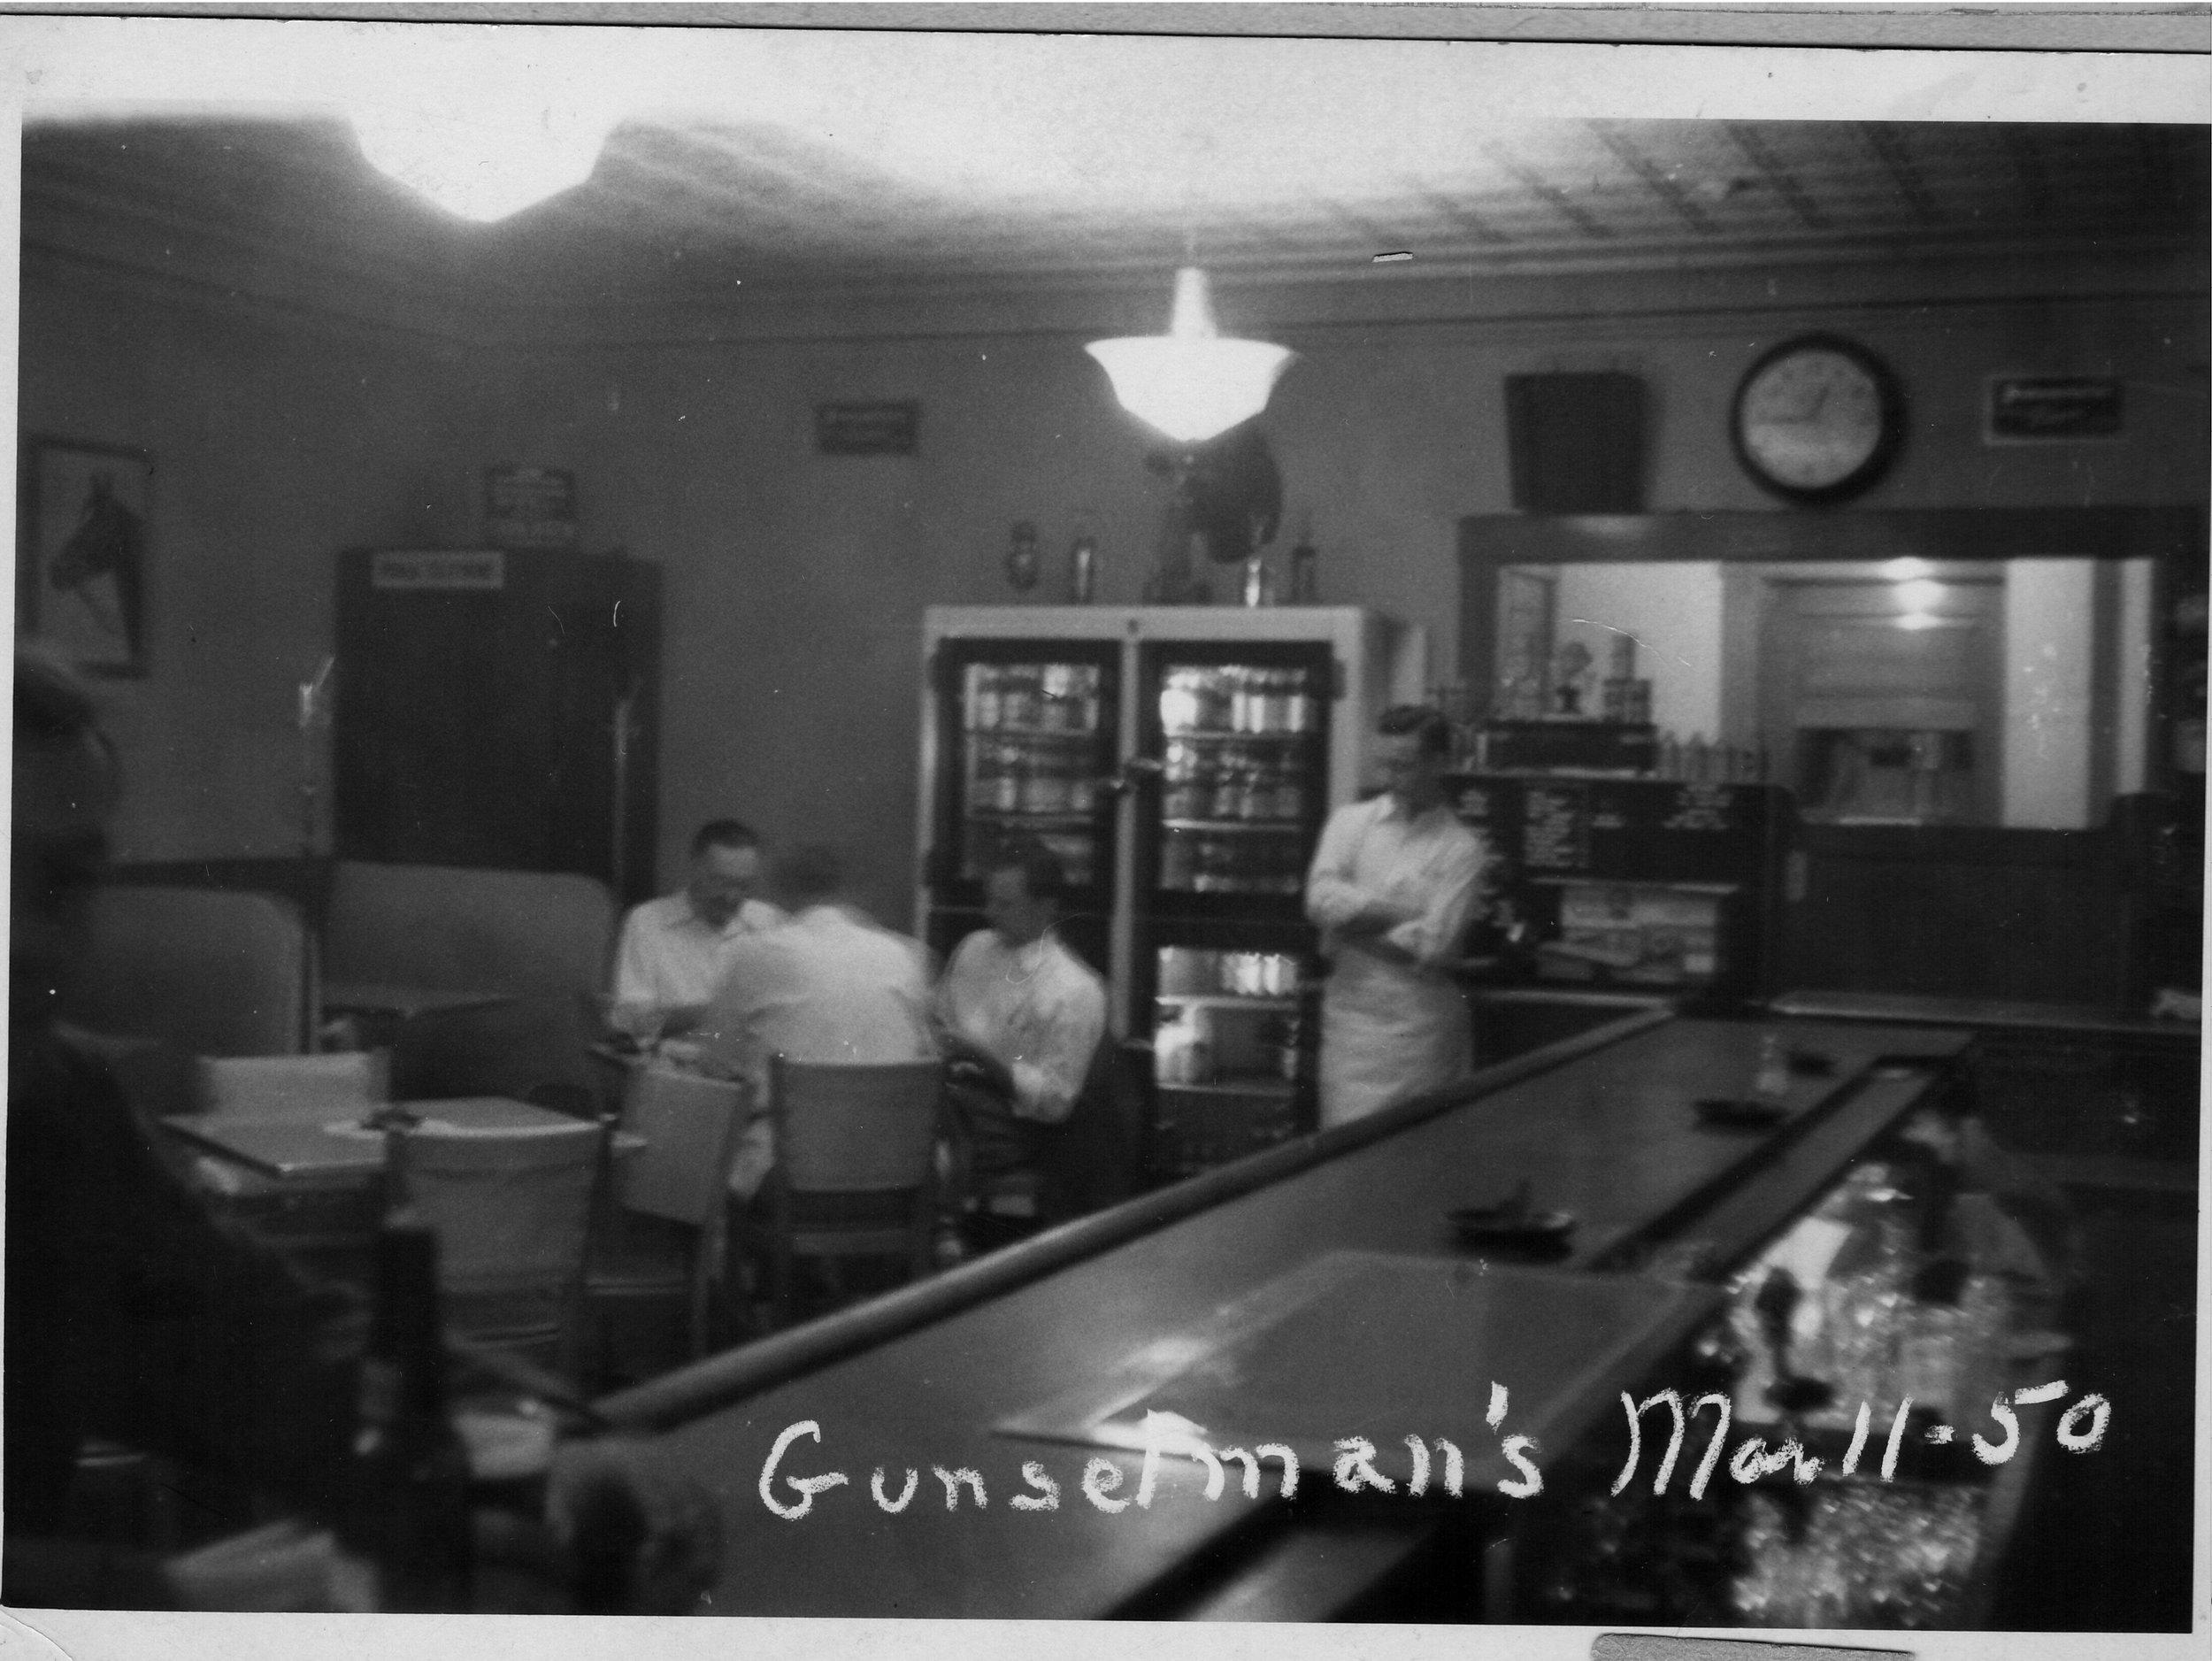 Gunselman's-Tavern---MARCH-11,-1950.jpg